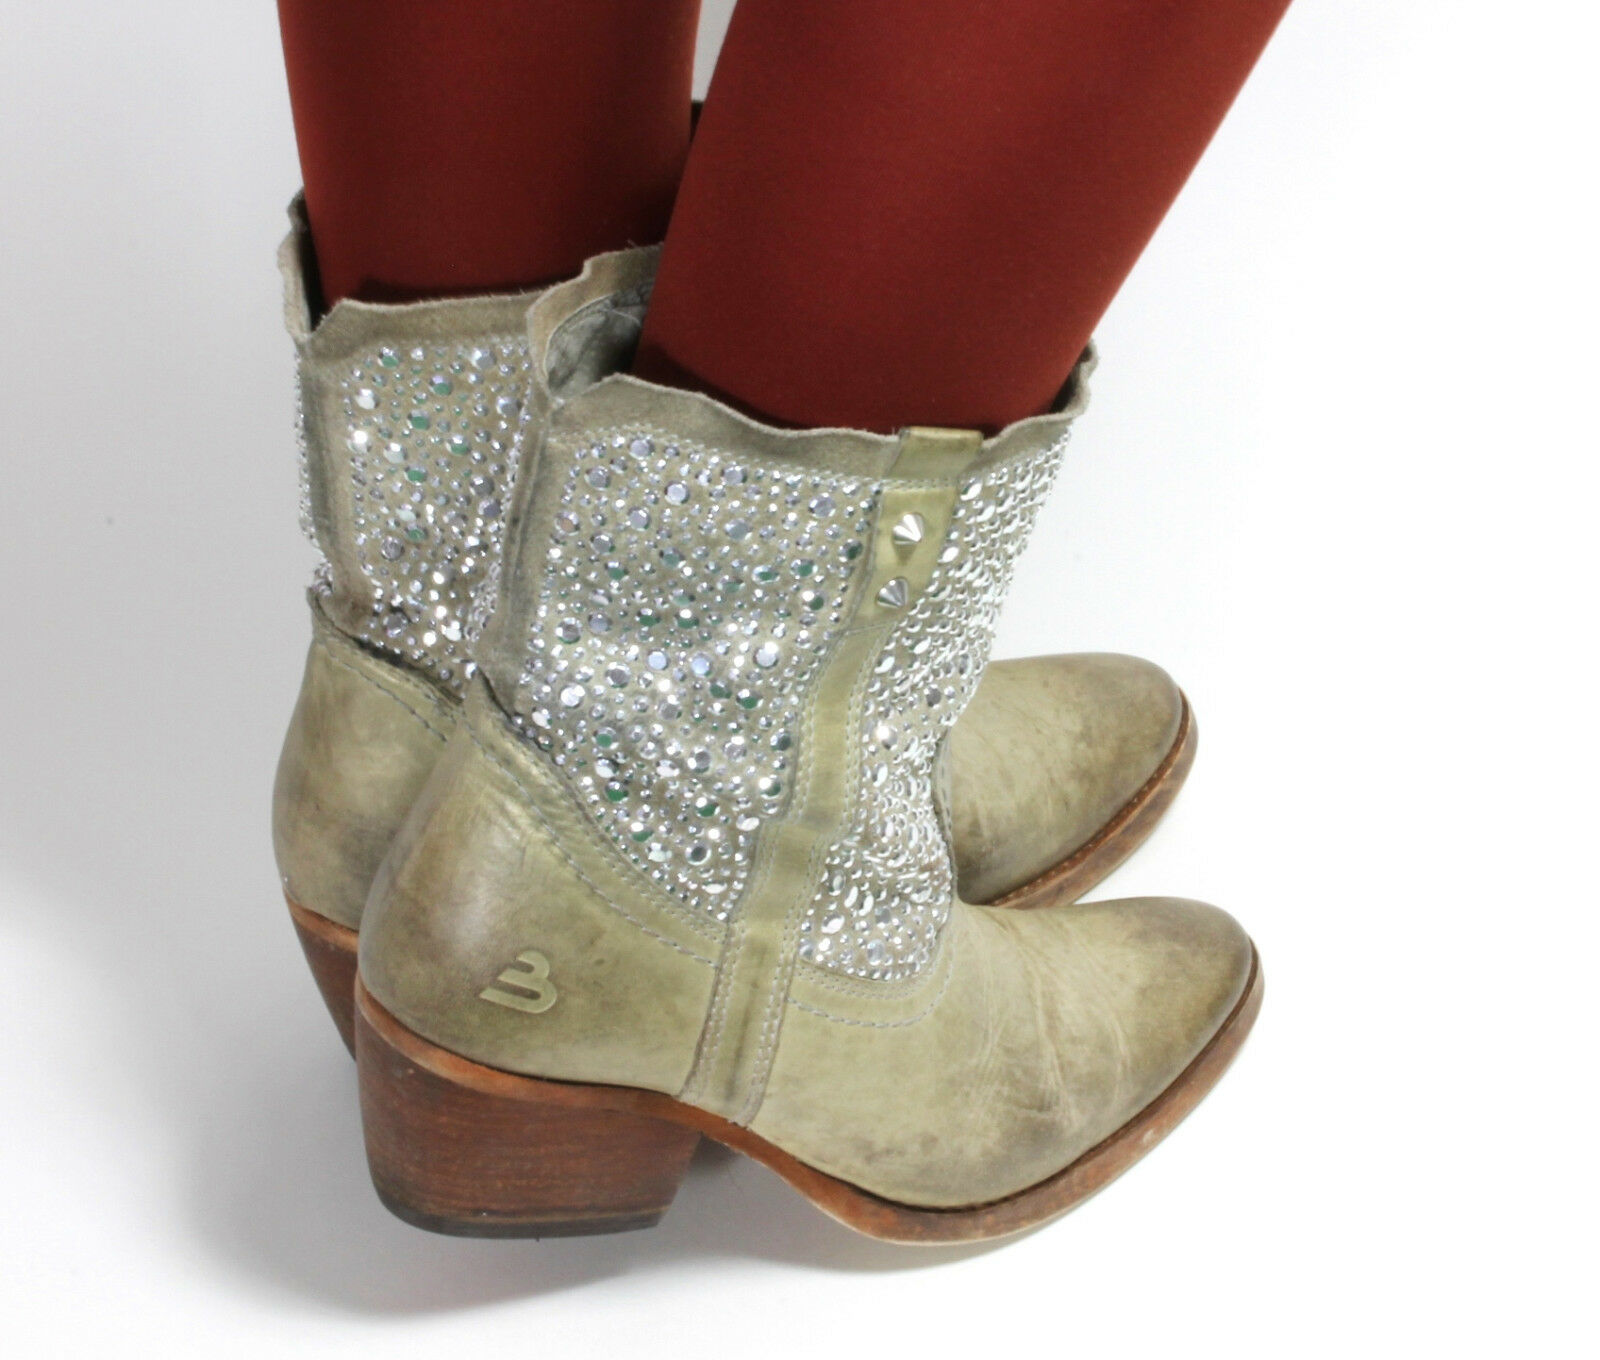 Stivali Western Cowboy Cowboy Western Stivali Catalan Style line dance Stivali Stivaletti 37 84b6cc